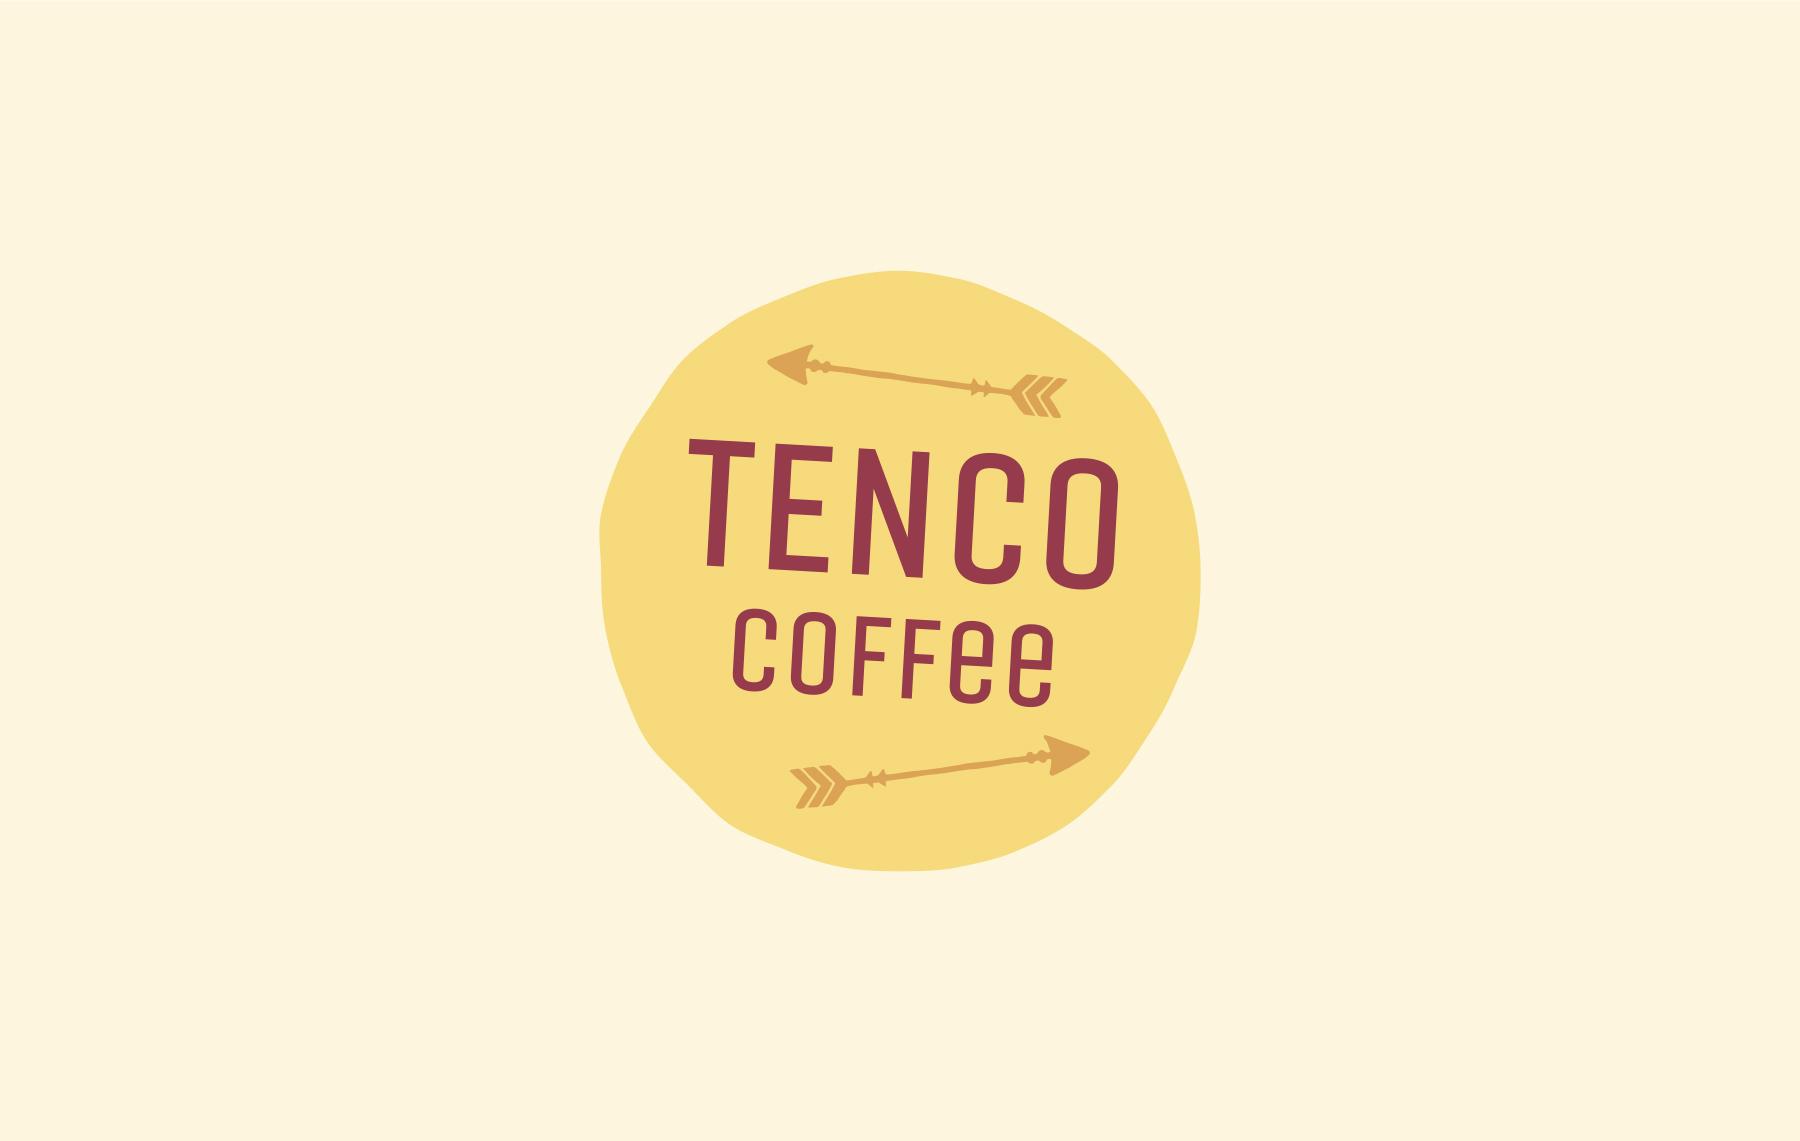 Carole_Chevalier-Tenco-Coffee-1.jpg